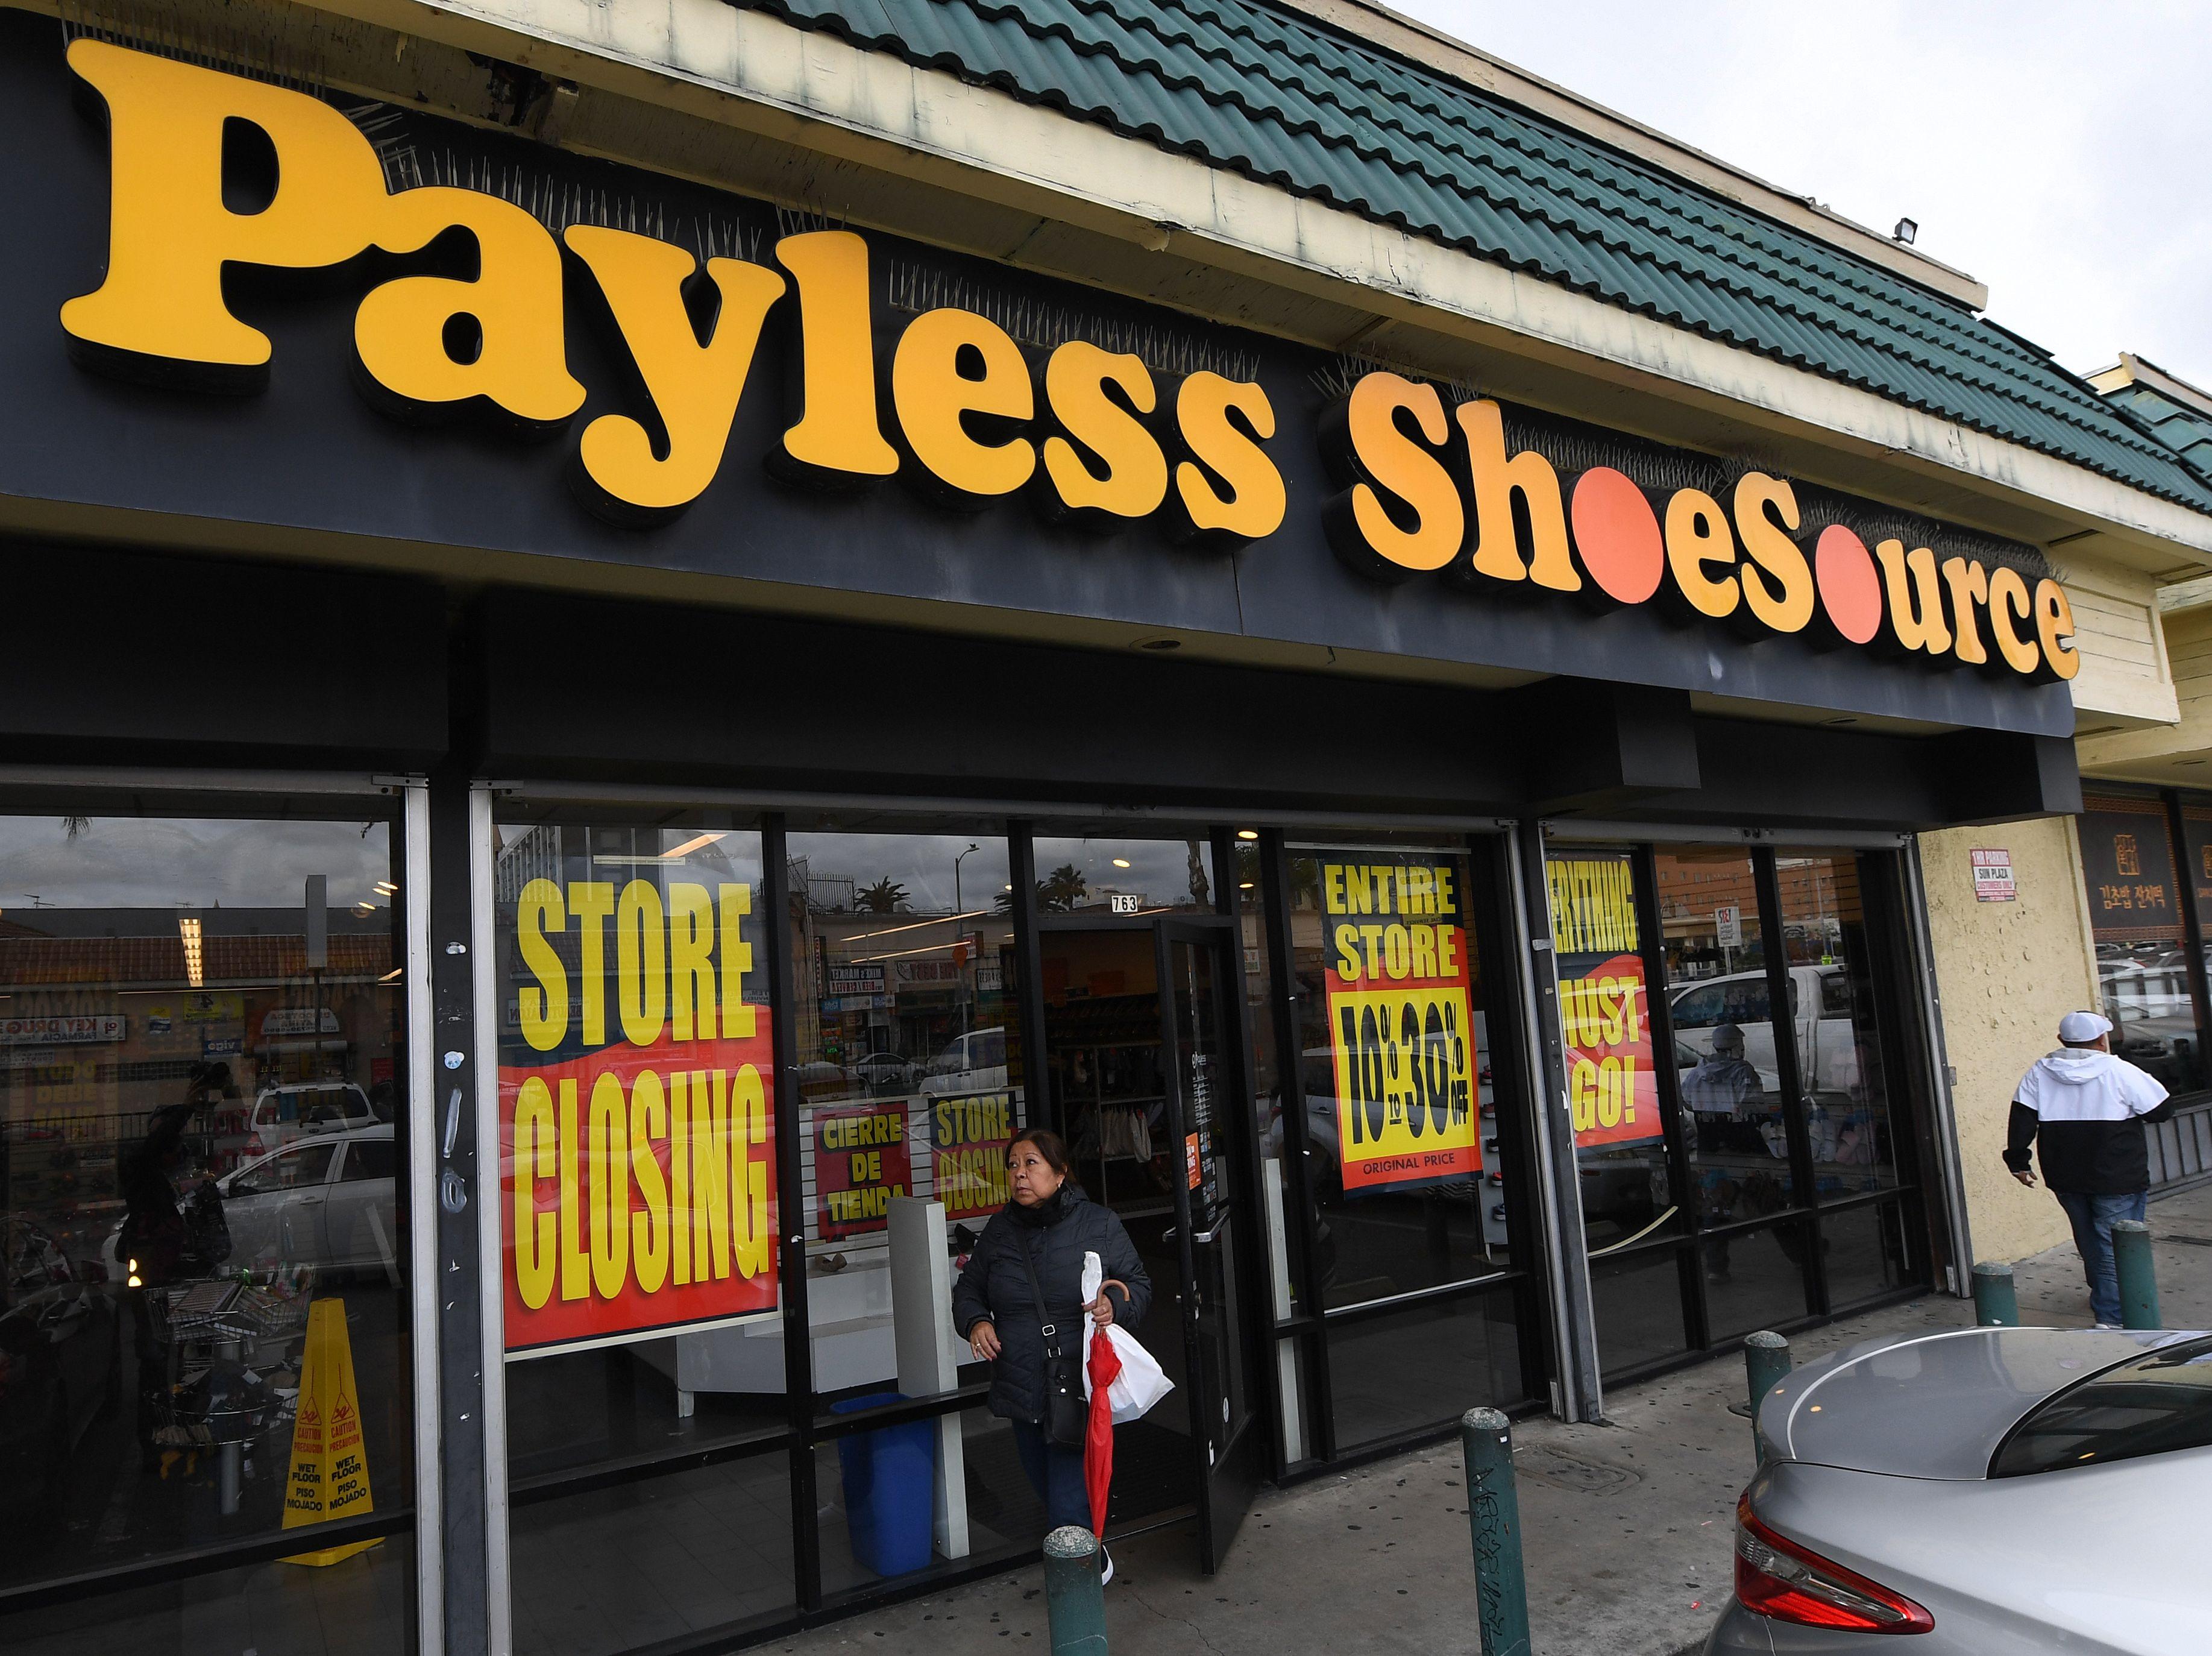 Payless Liquidation Sale 2019: Payless